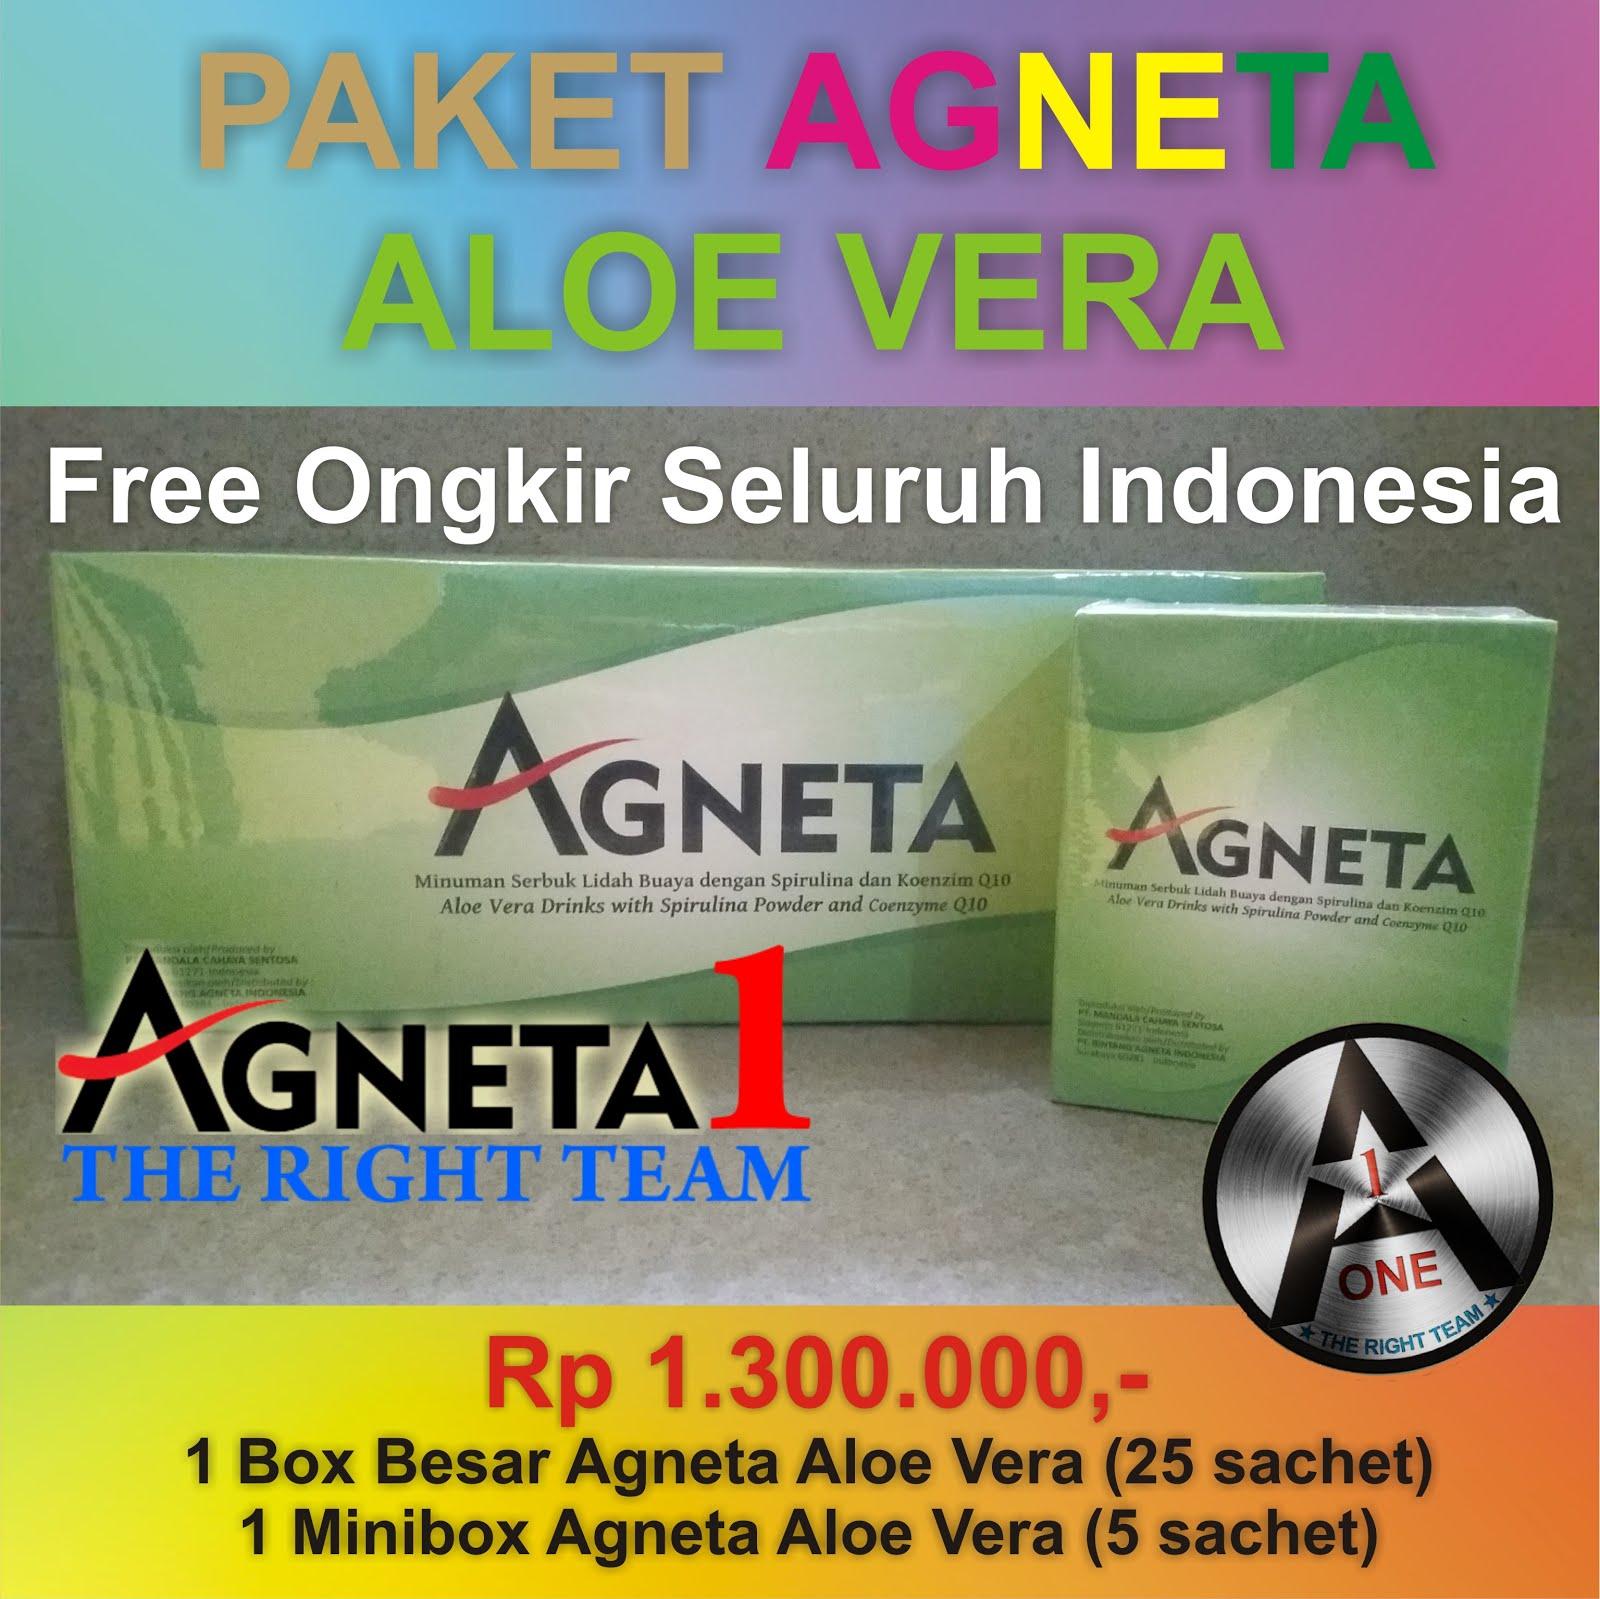 Produk Agneta Aloe Vera